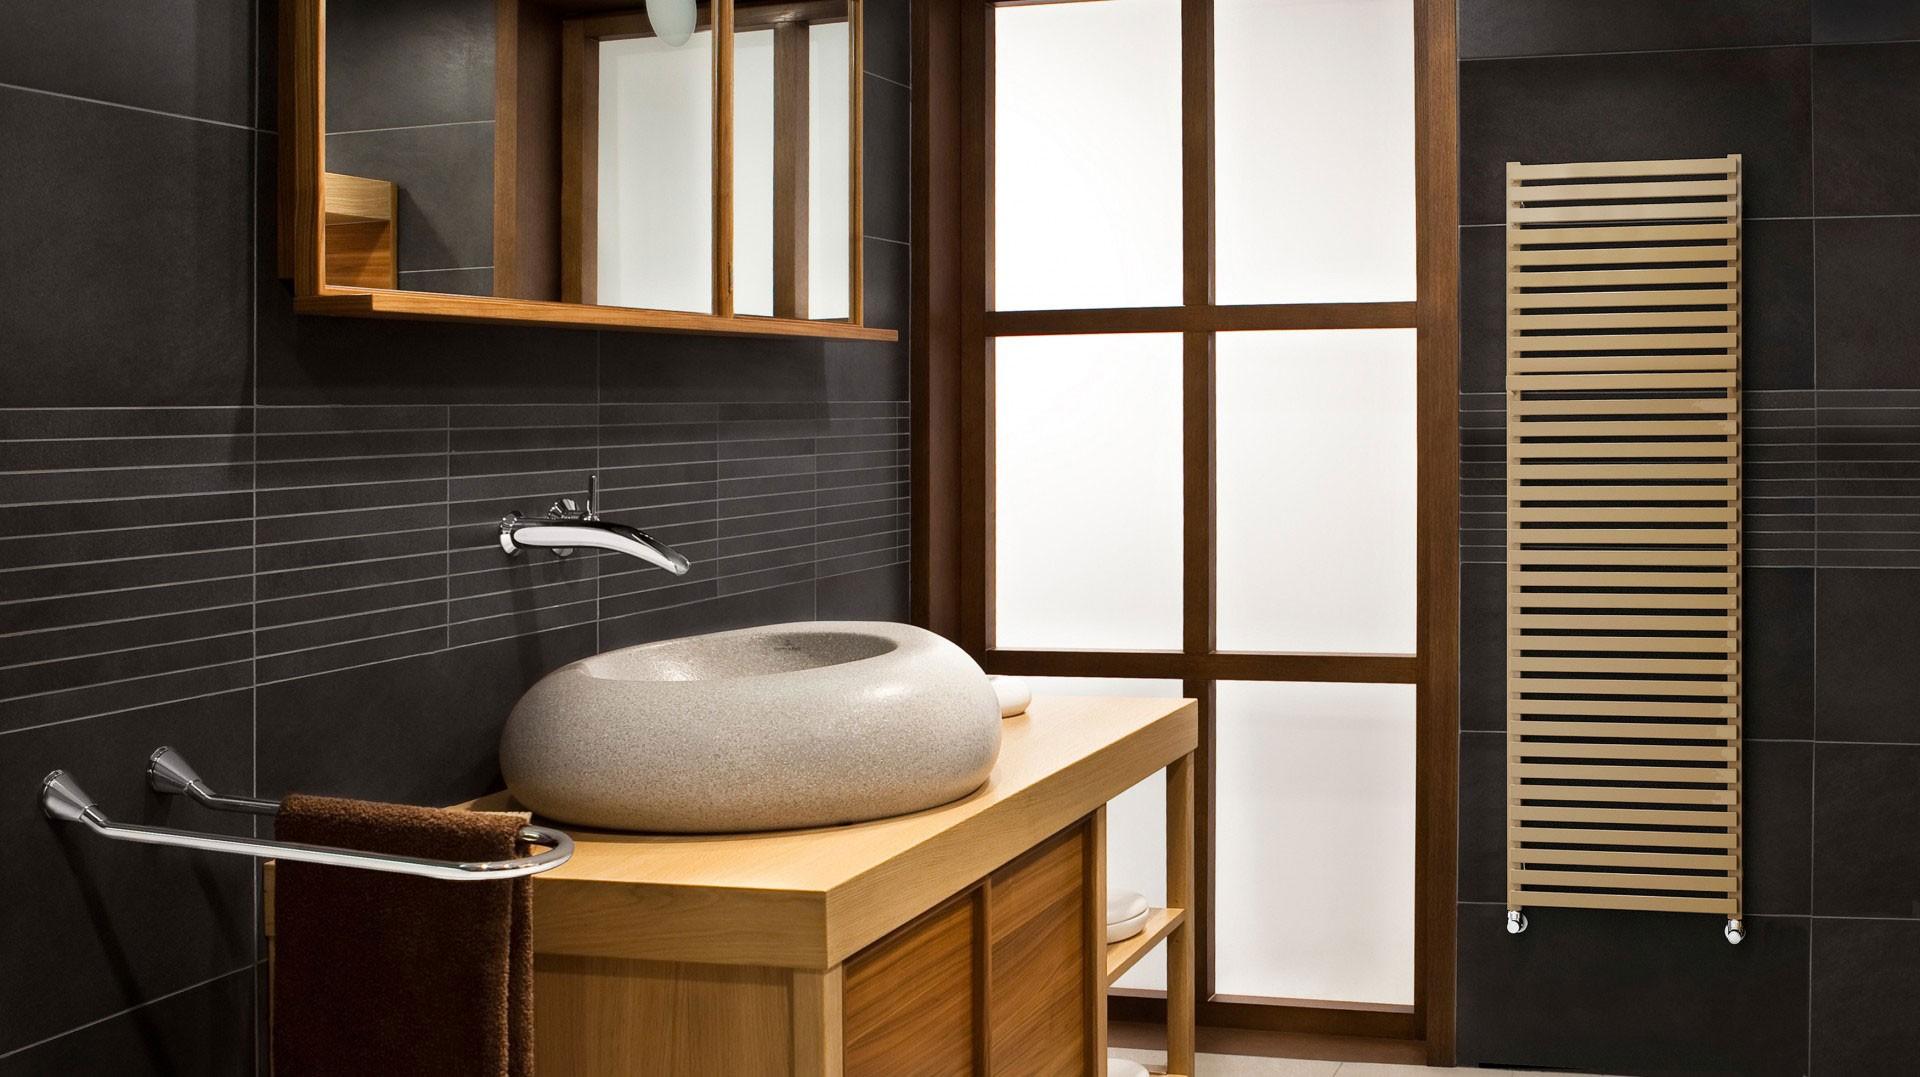 Badheizkörper, Handtuchwärmer modern, Terma City